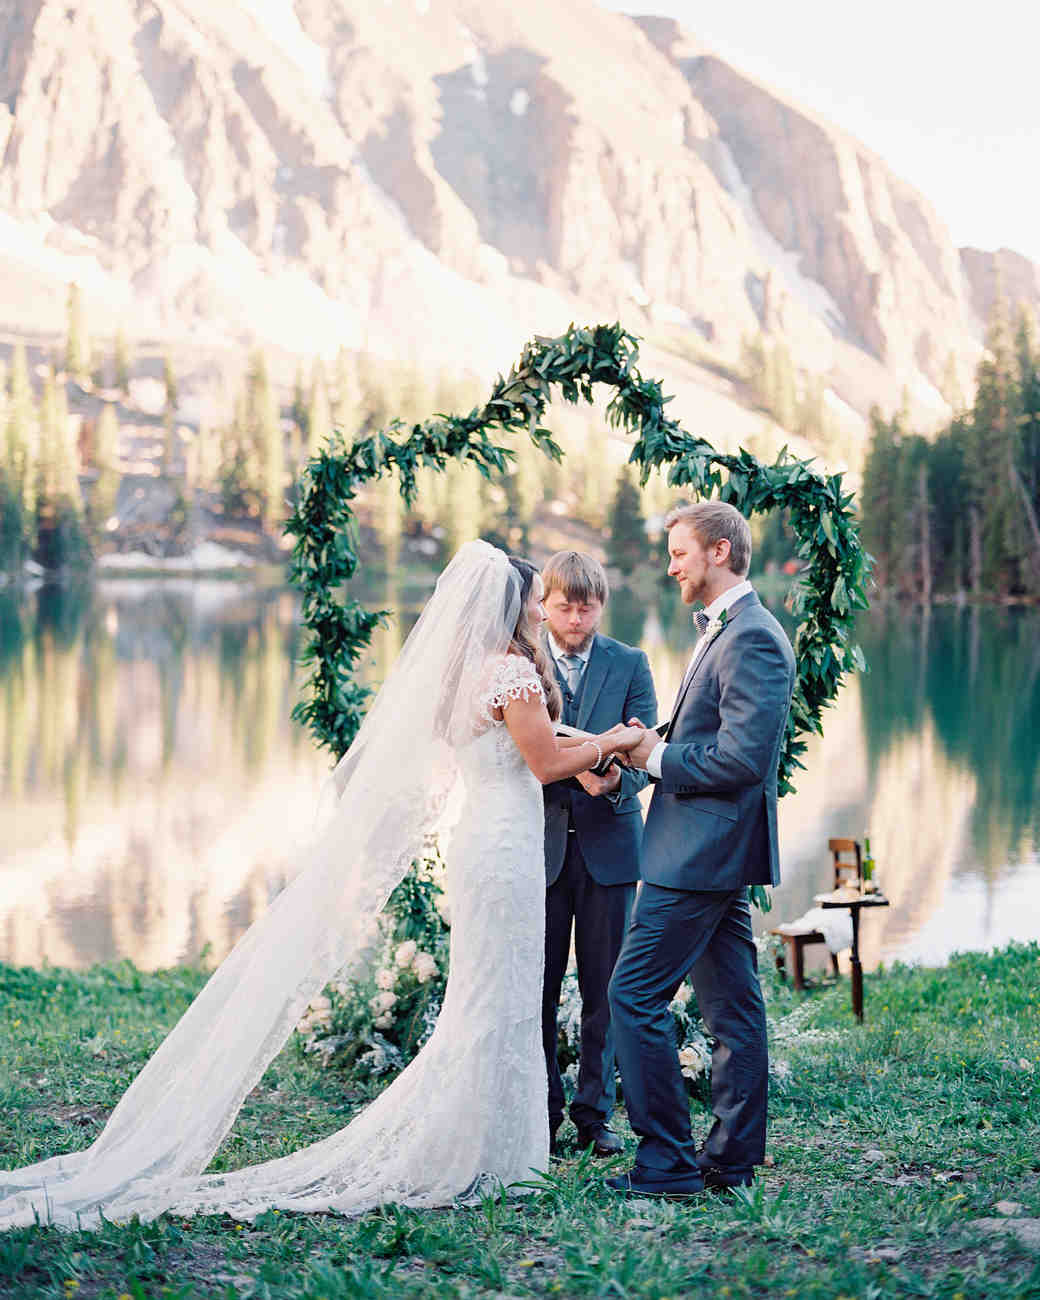 mckenzie-brandon-wedding-ceremony-21-s112364-1115.jpg